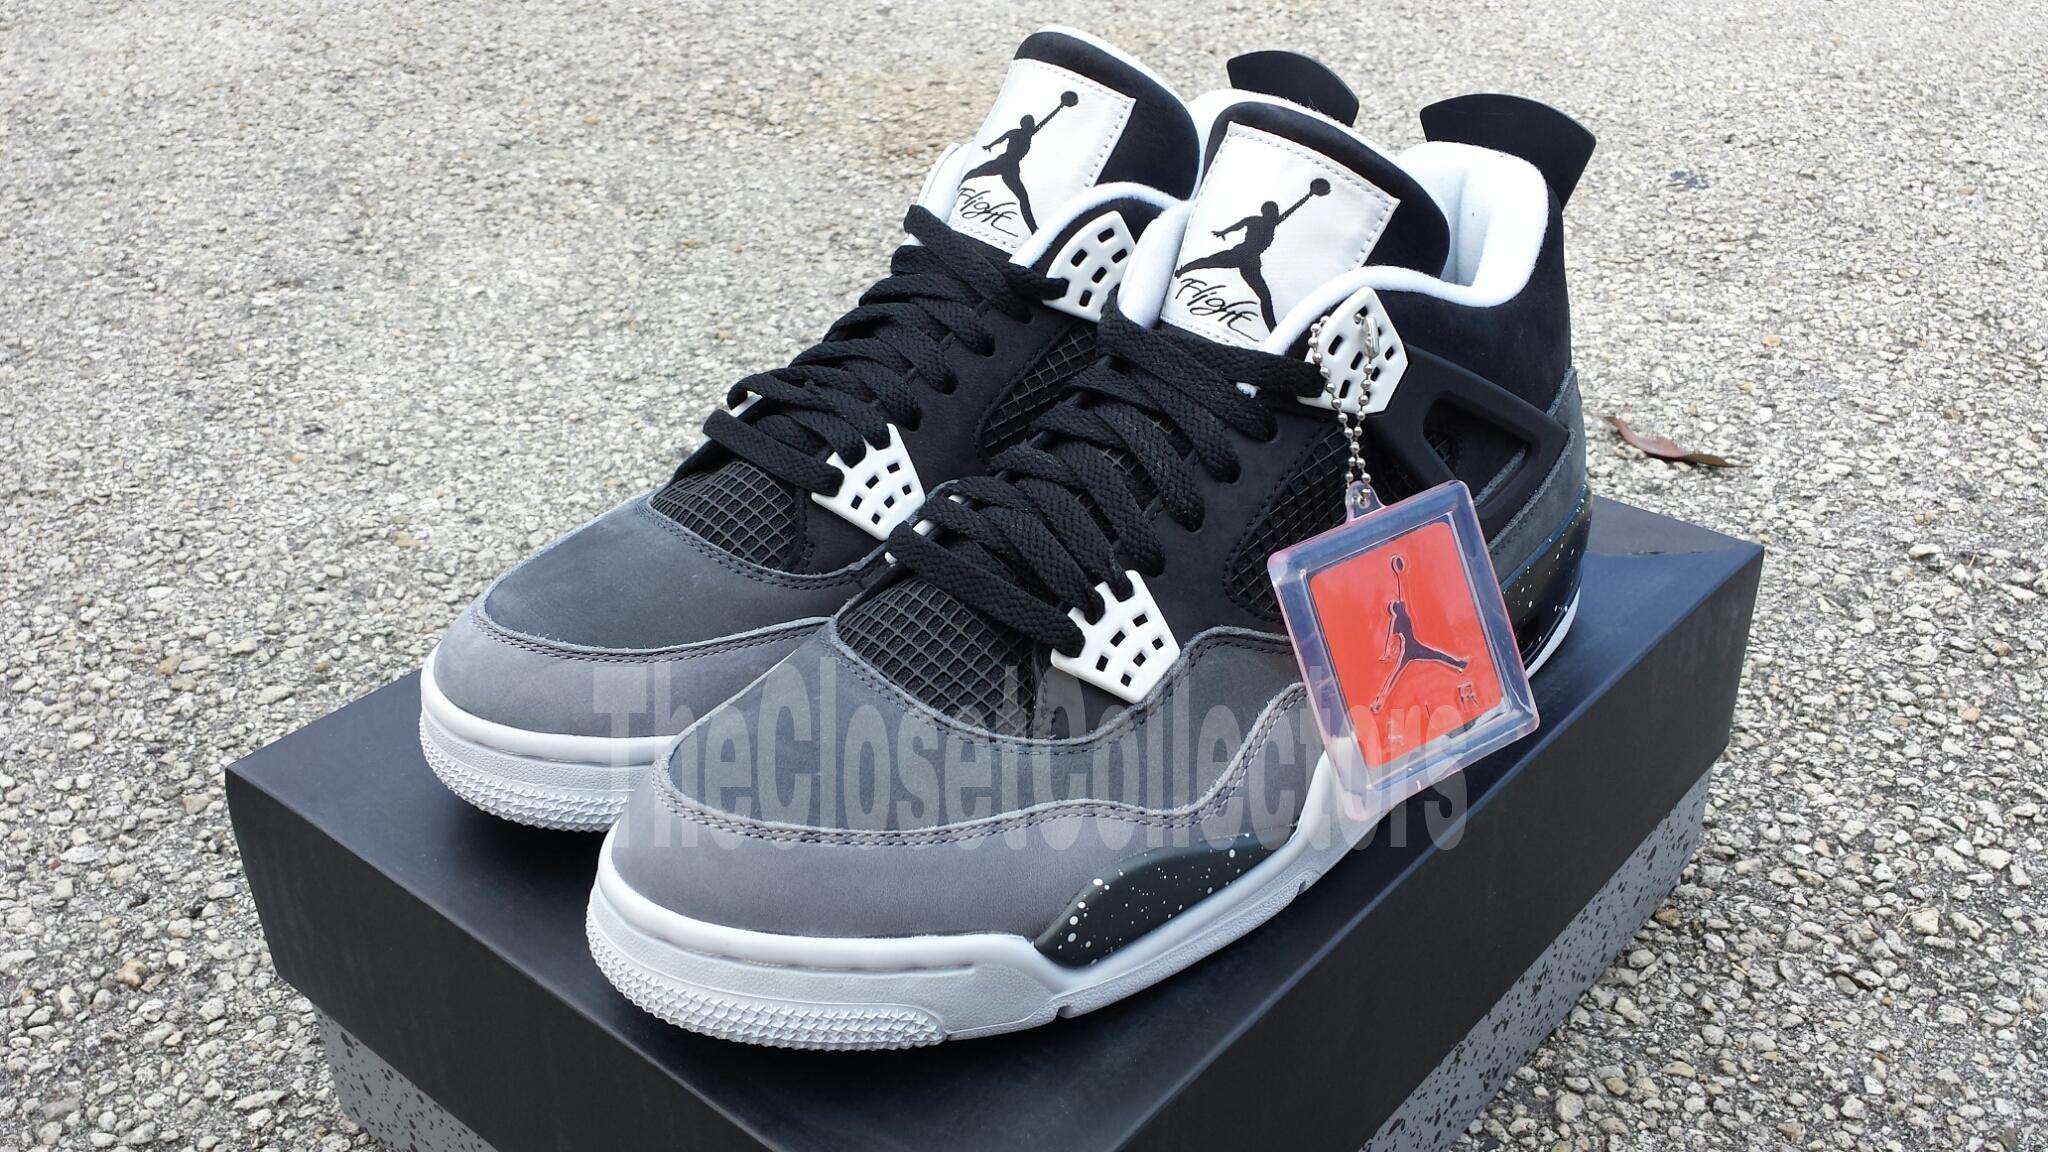 Oreo 4 Jordans 6 And A Half